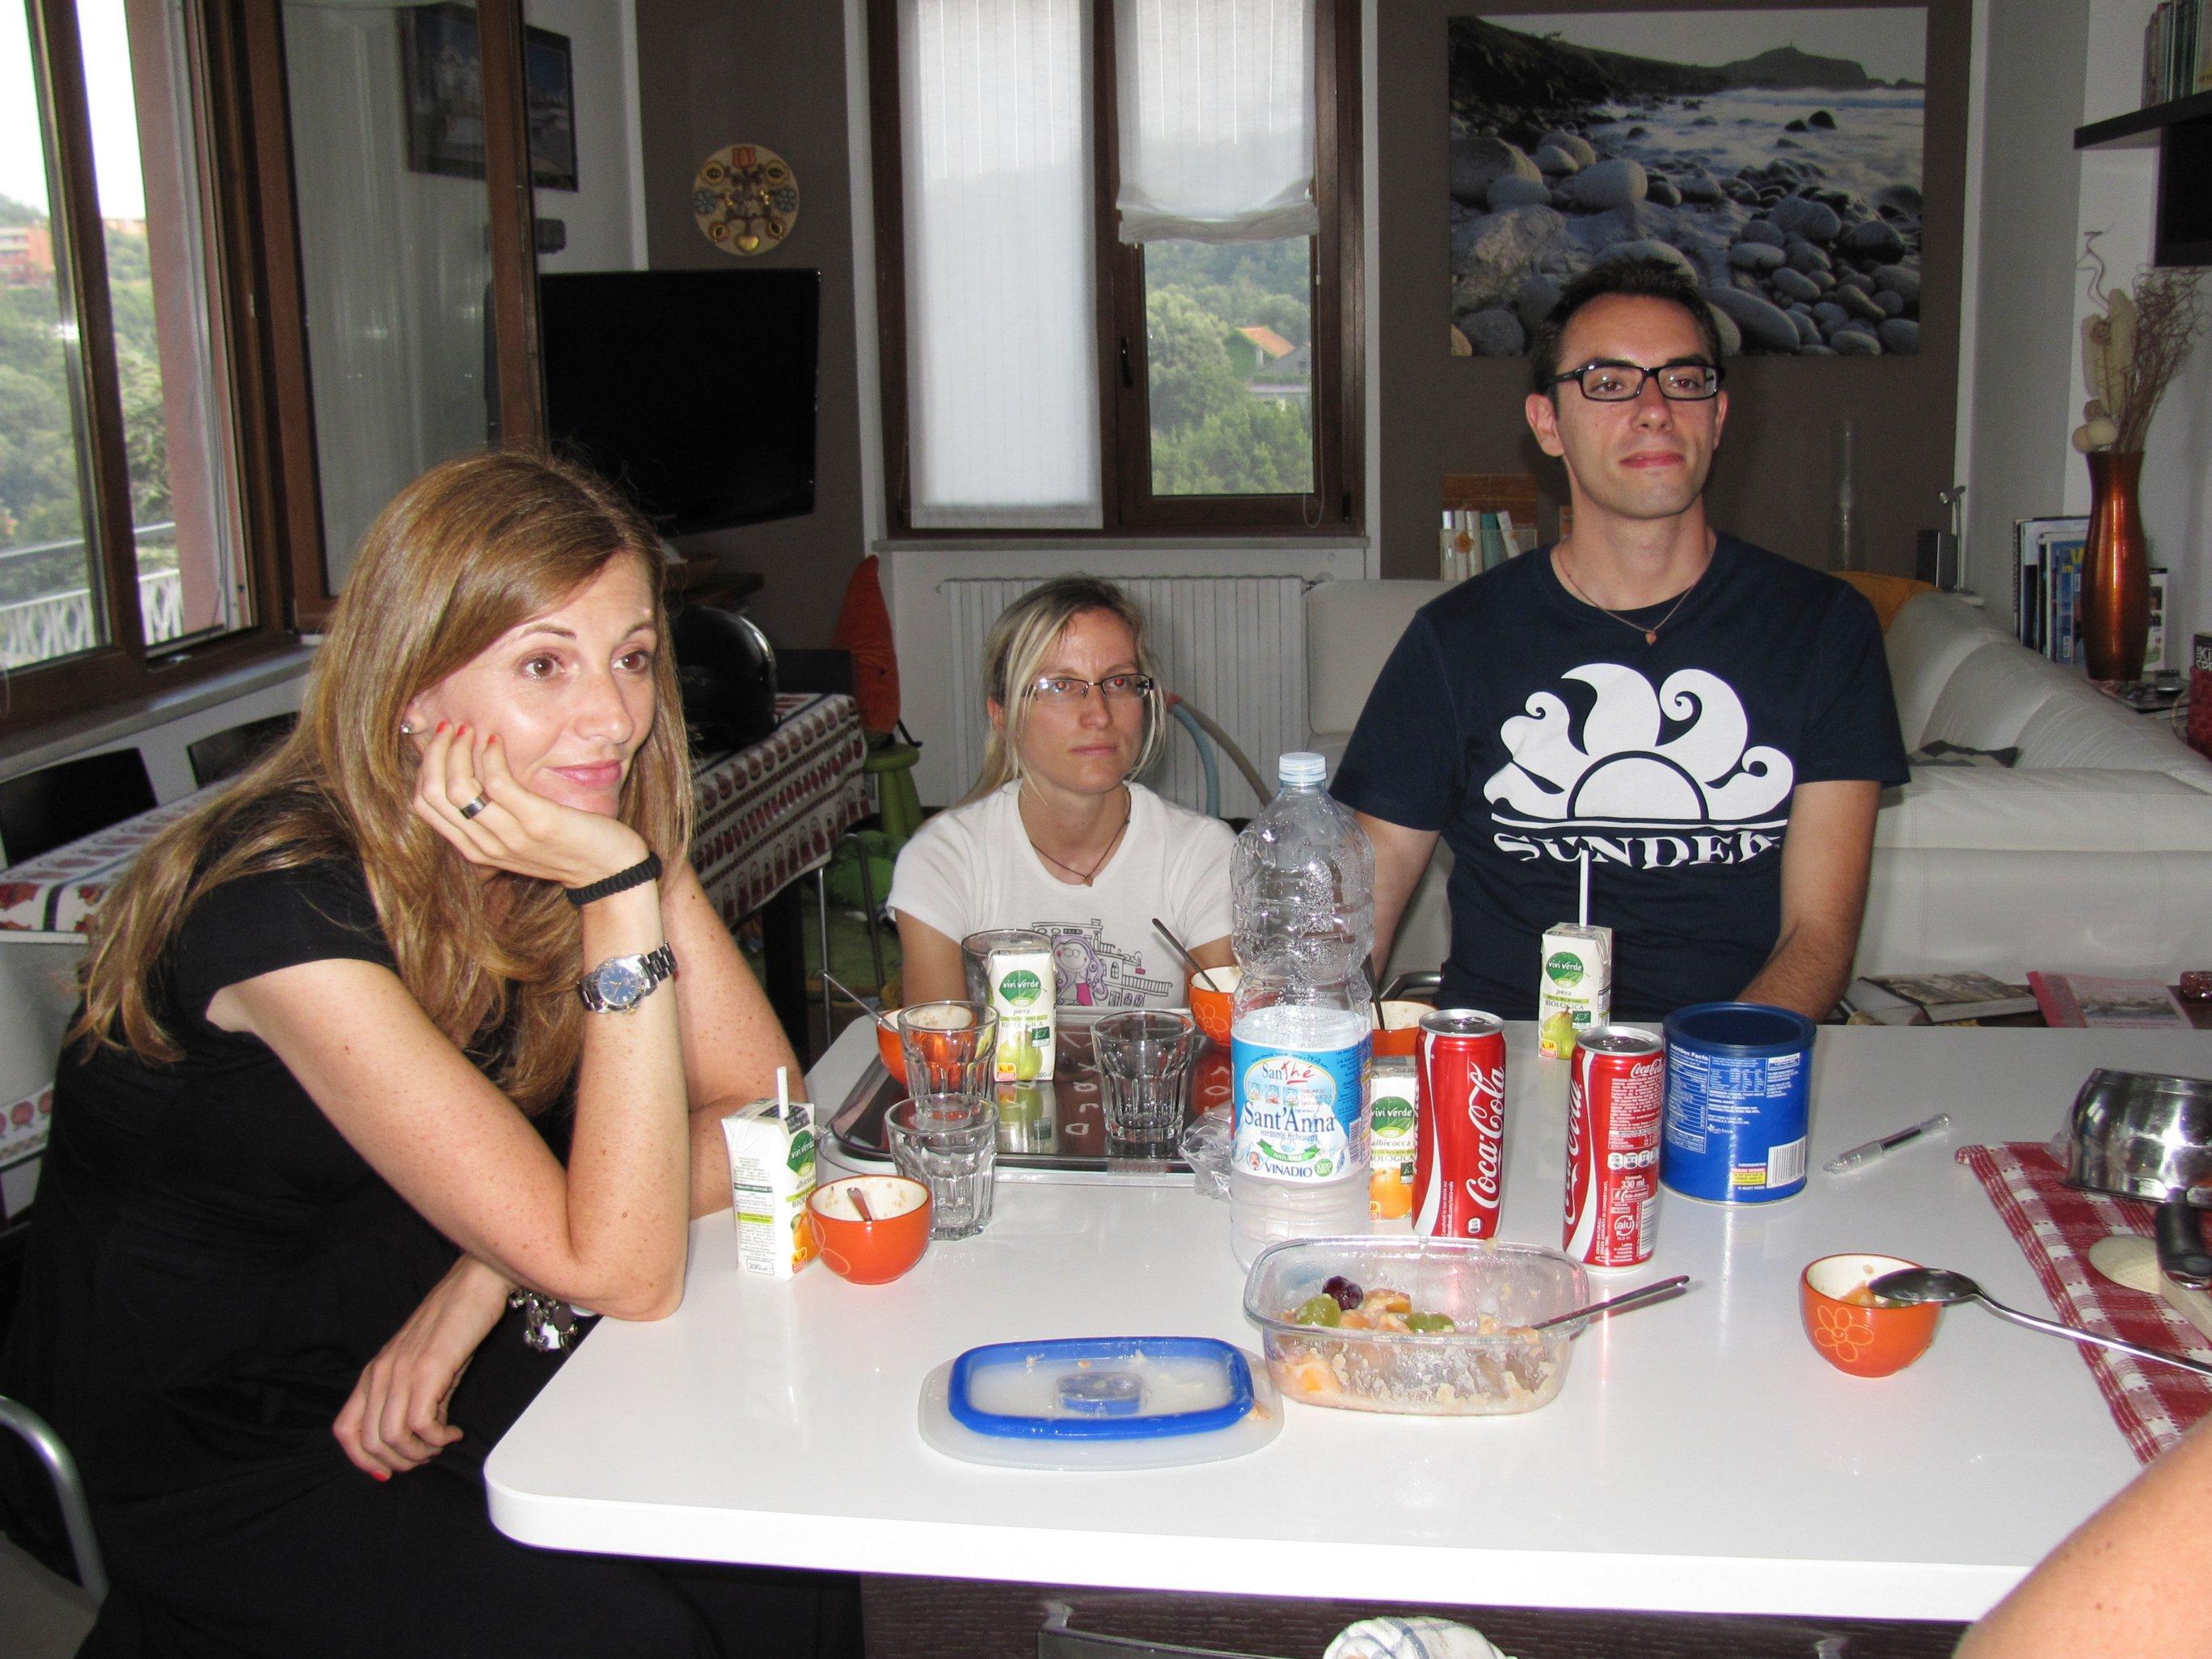 lara_elena_fabrizio_tiziana_2013-07-17-19-25-40